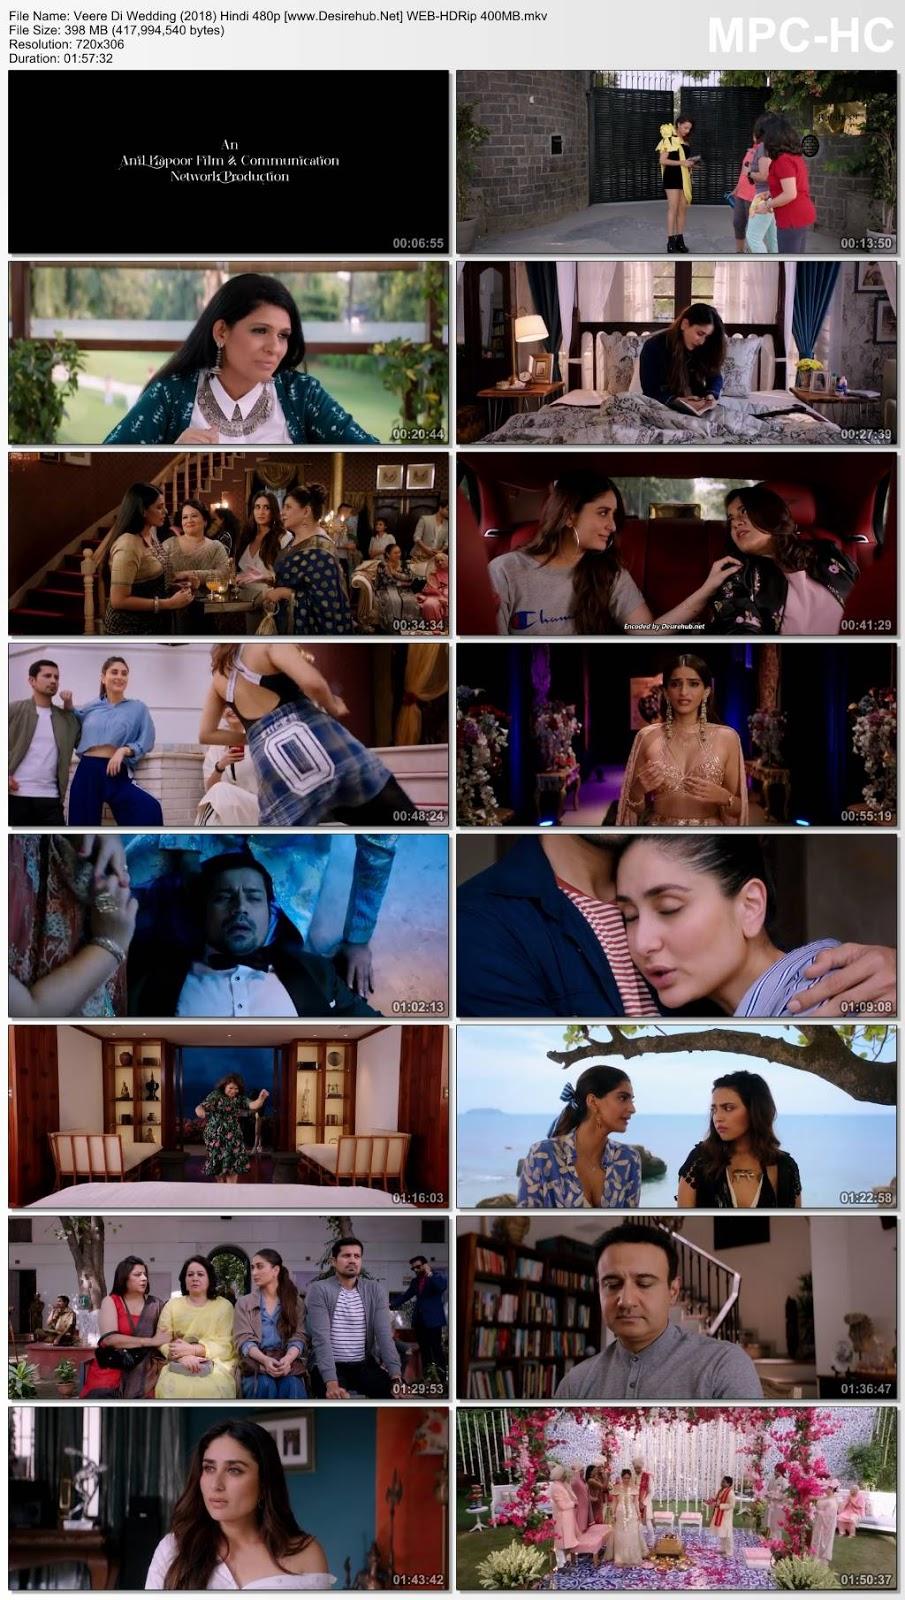 Veere Di Wedding (2018) Hindi 480p WEB-HDRip – 400MB Desirehub